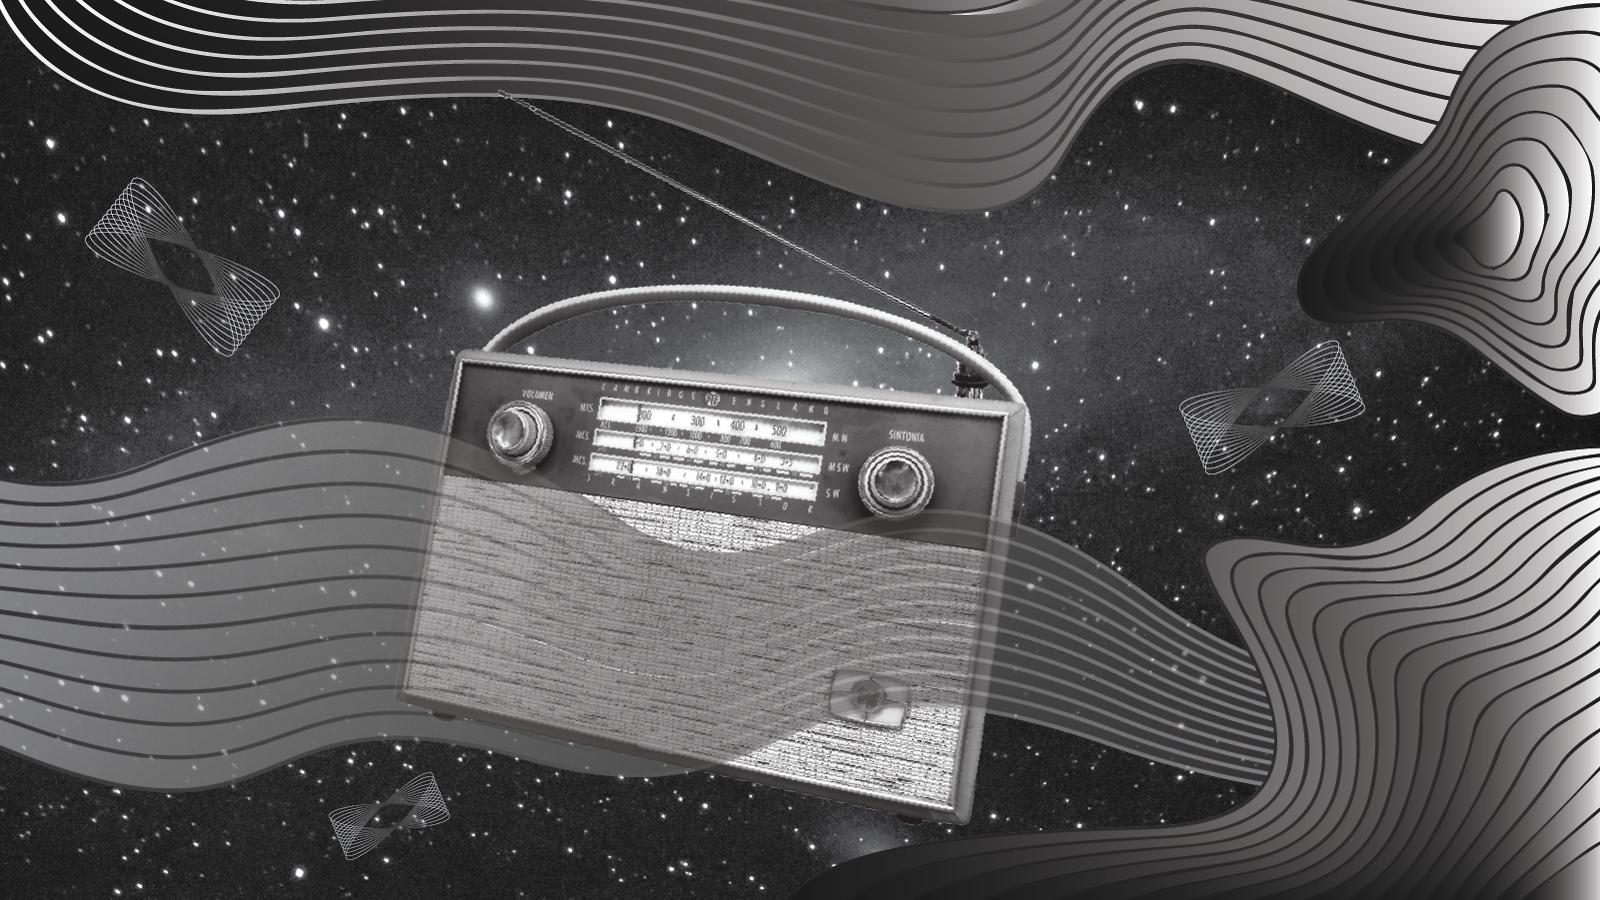 A dark matter radio floats through space